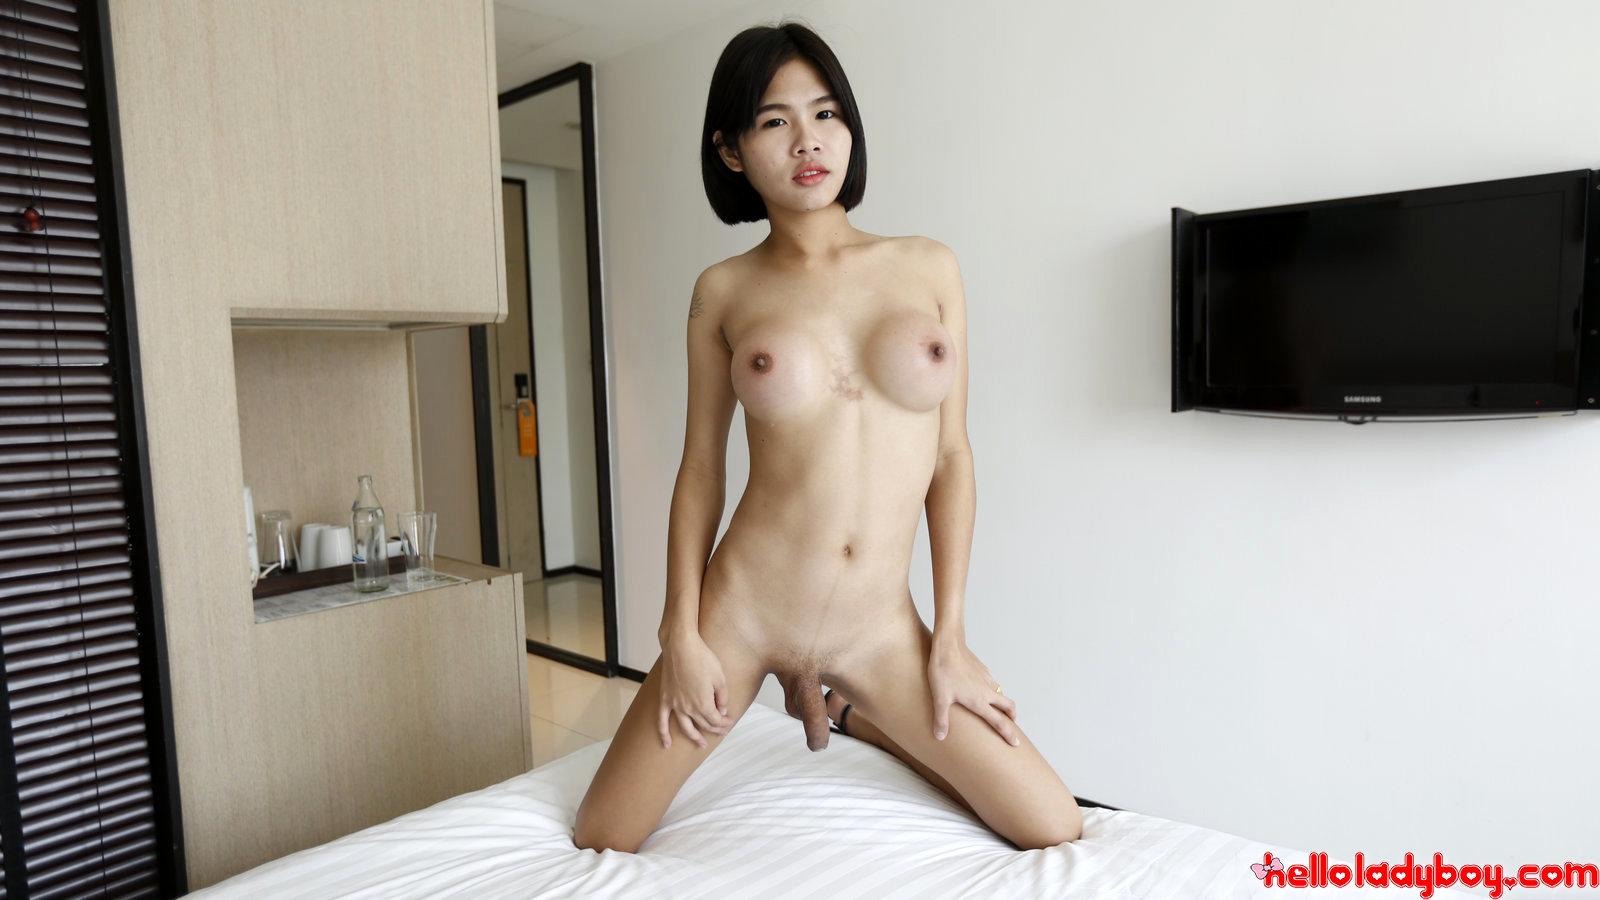 21 Yr Old Shy Asian Ladyboy Sucks Off Tourists Penis